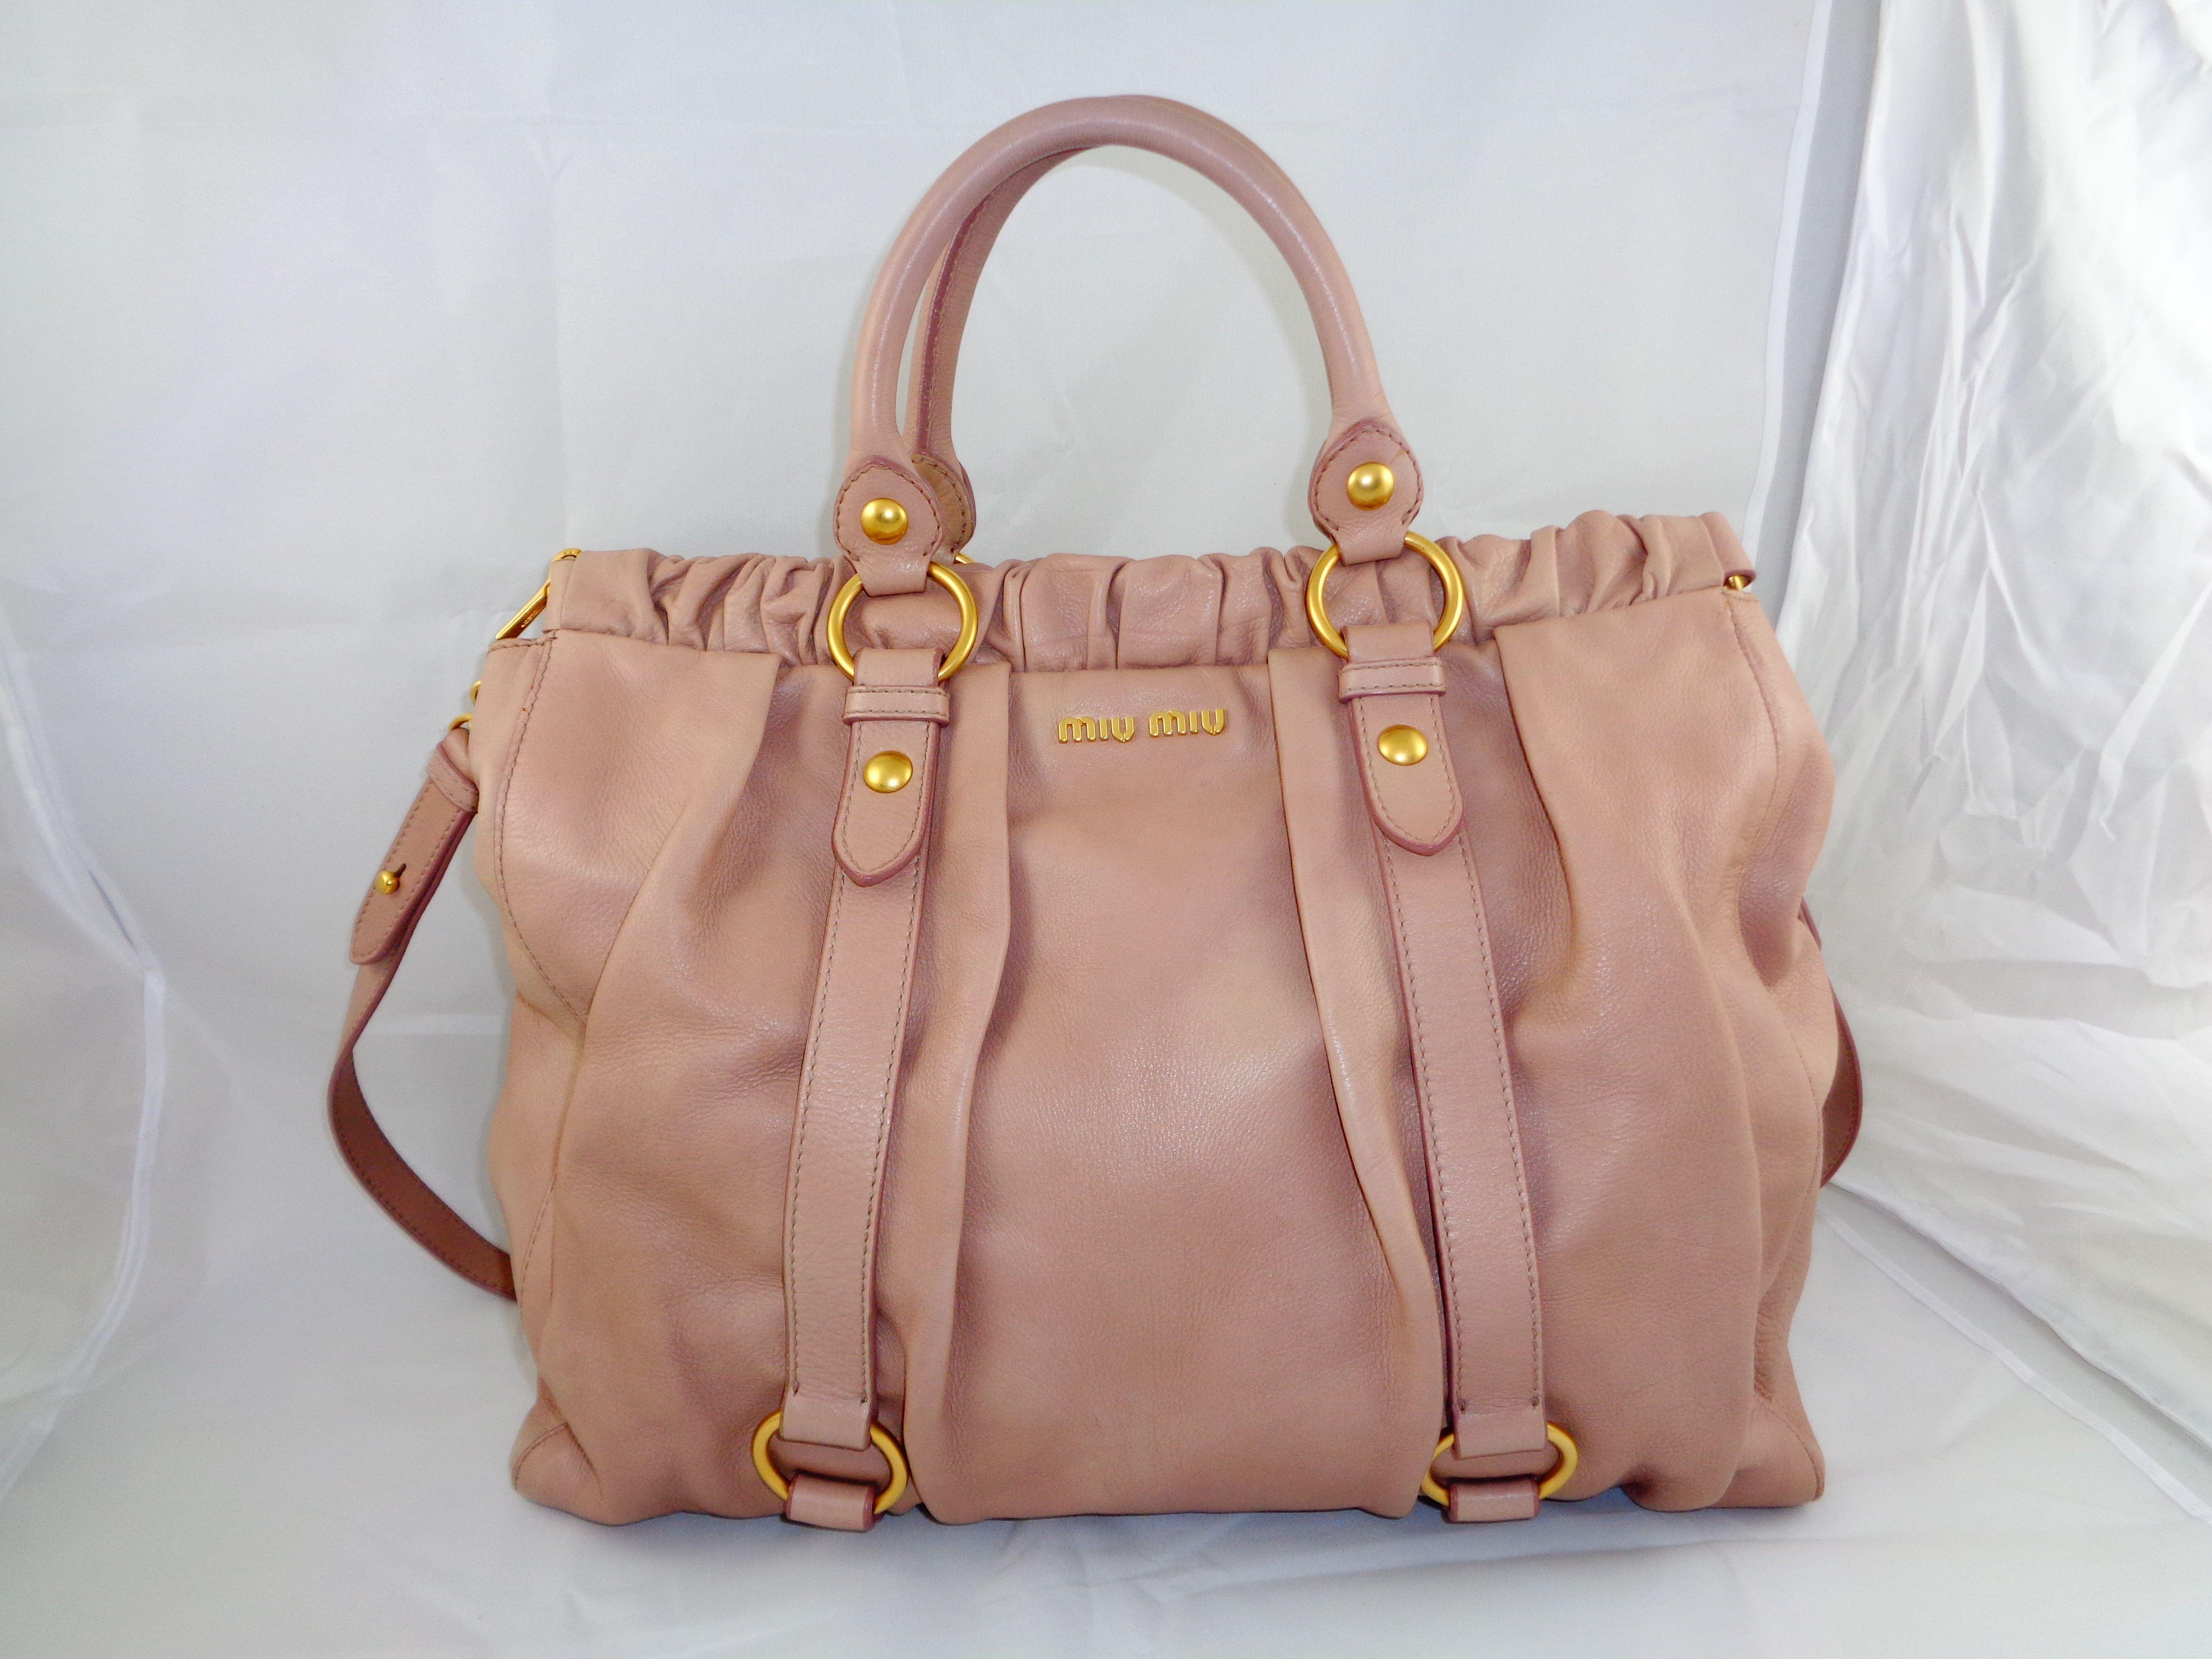 93f70a63d2f5 Miu Miu by PRADA Large Vitello Lux Calf Skin Satchel Shoulder Bag MSRP    1